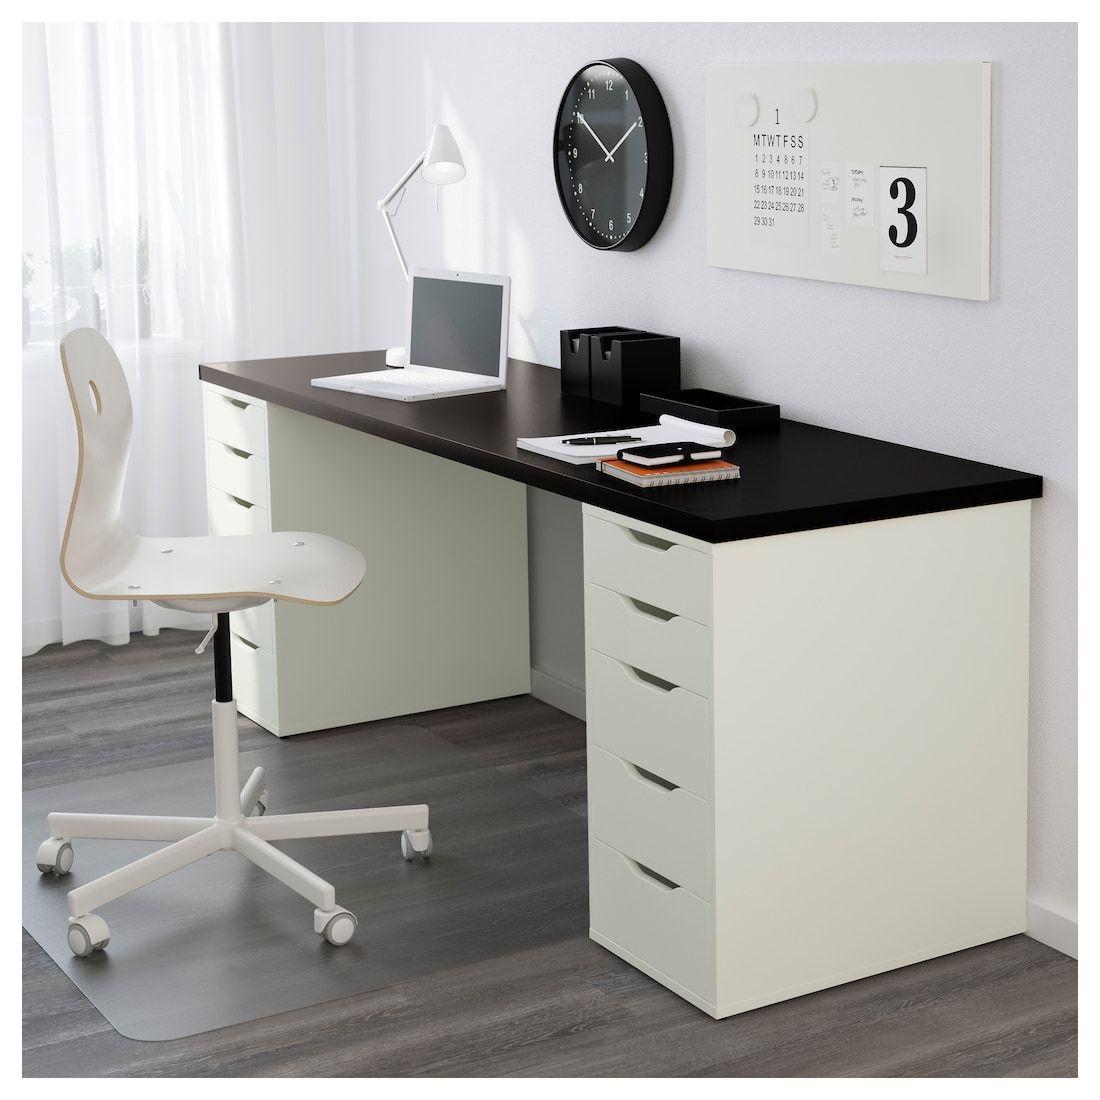 Alex Drawer Unit White 14 1 8x27 1 2 Ikea Cheap Office Furniture Home Office Design Drawer Unit